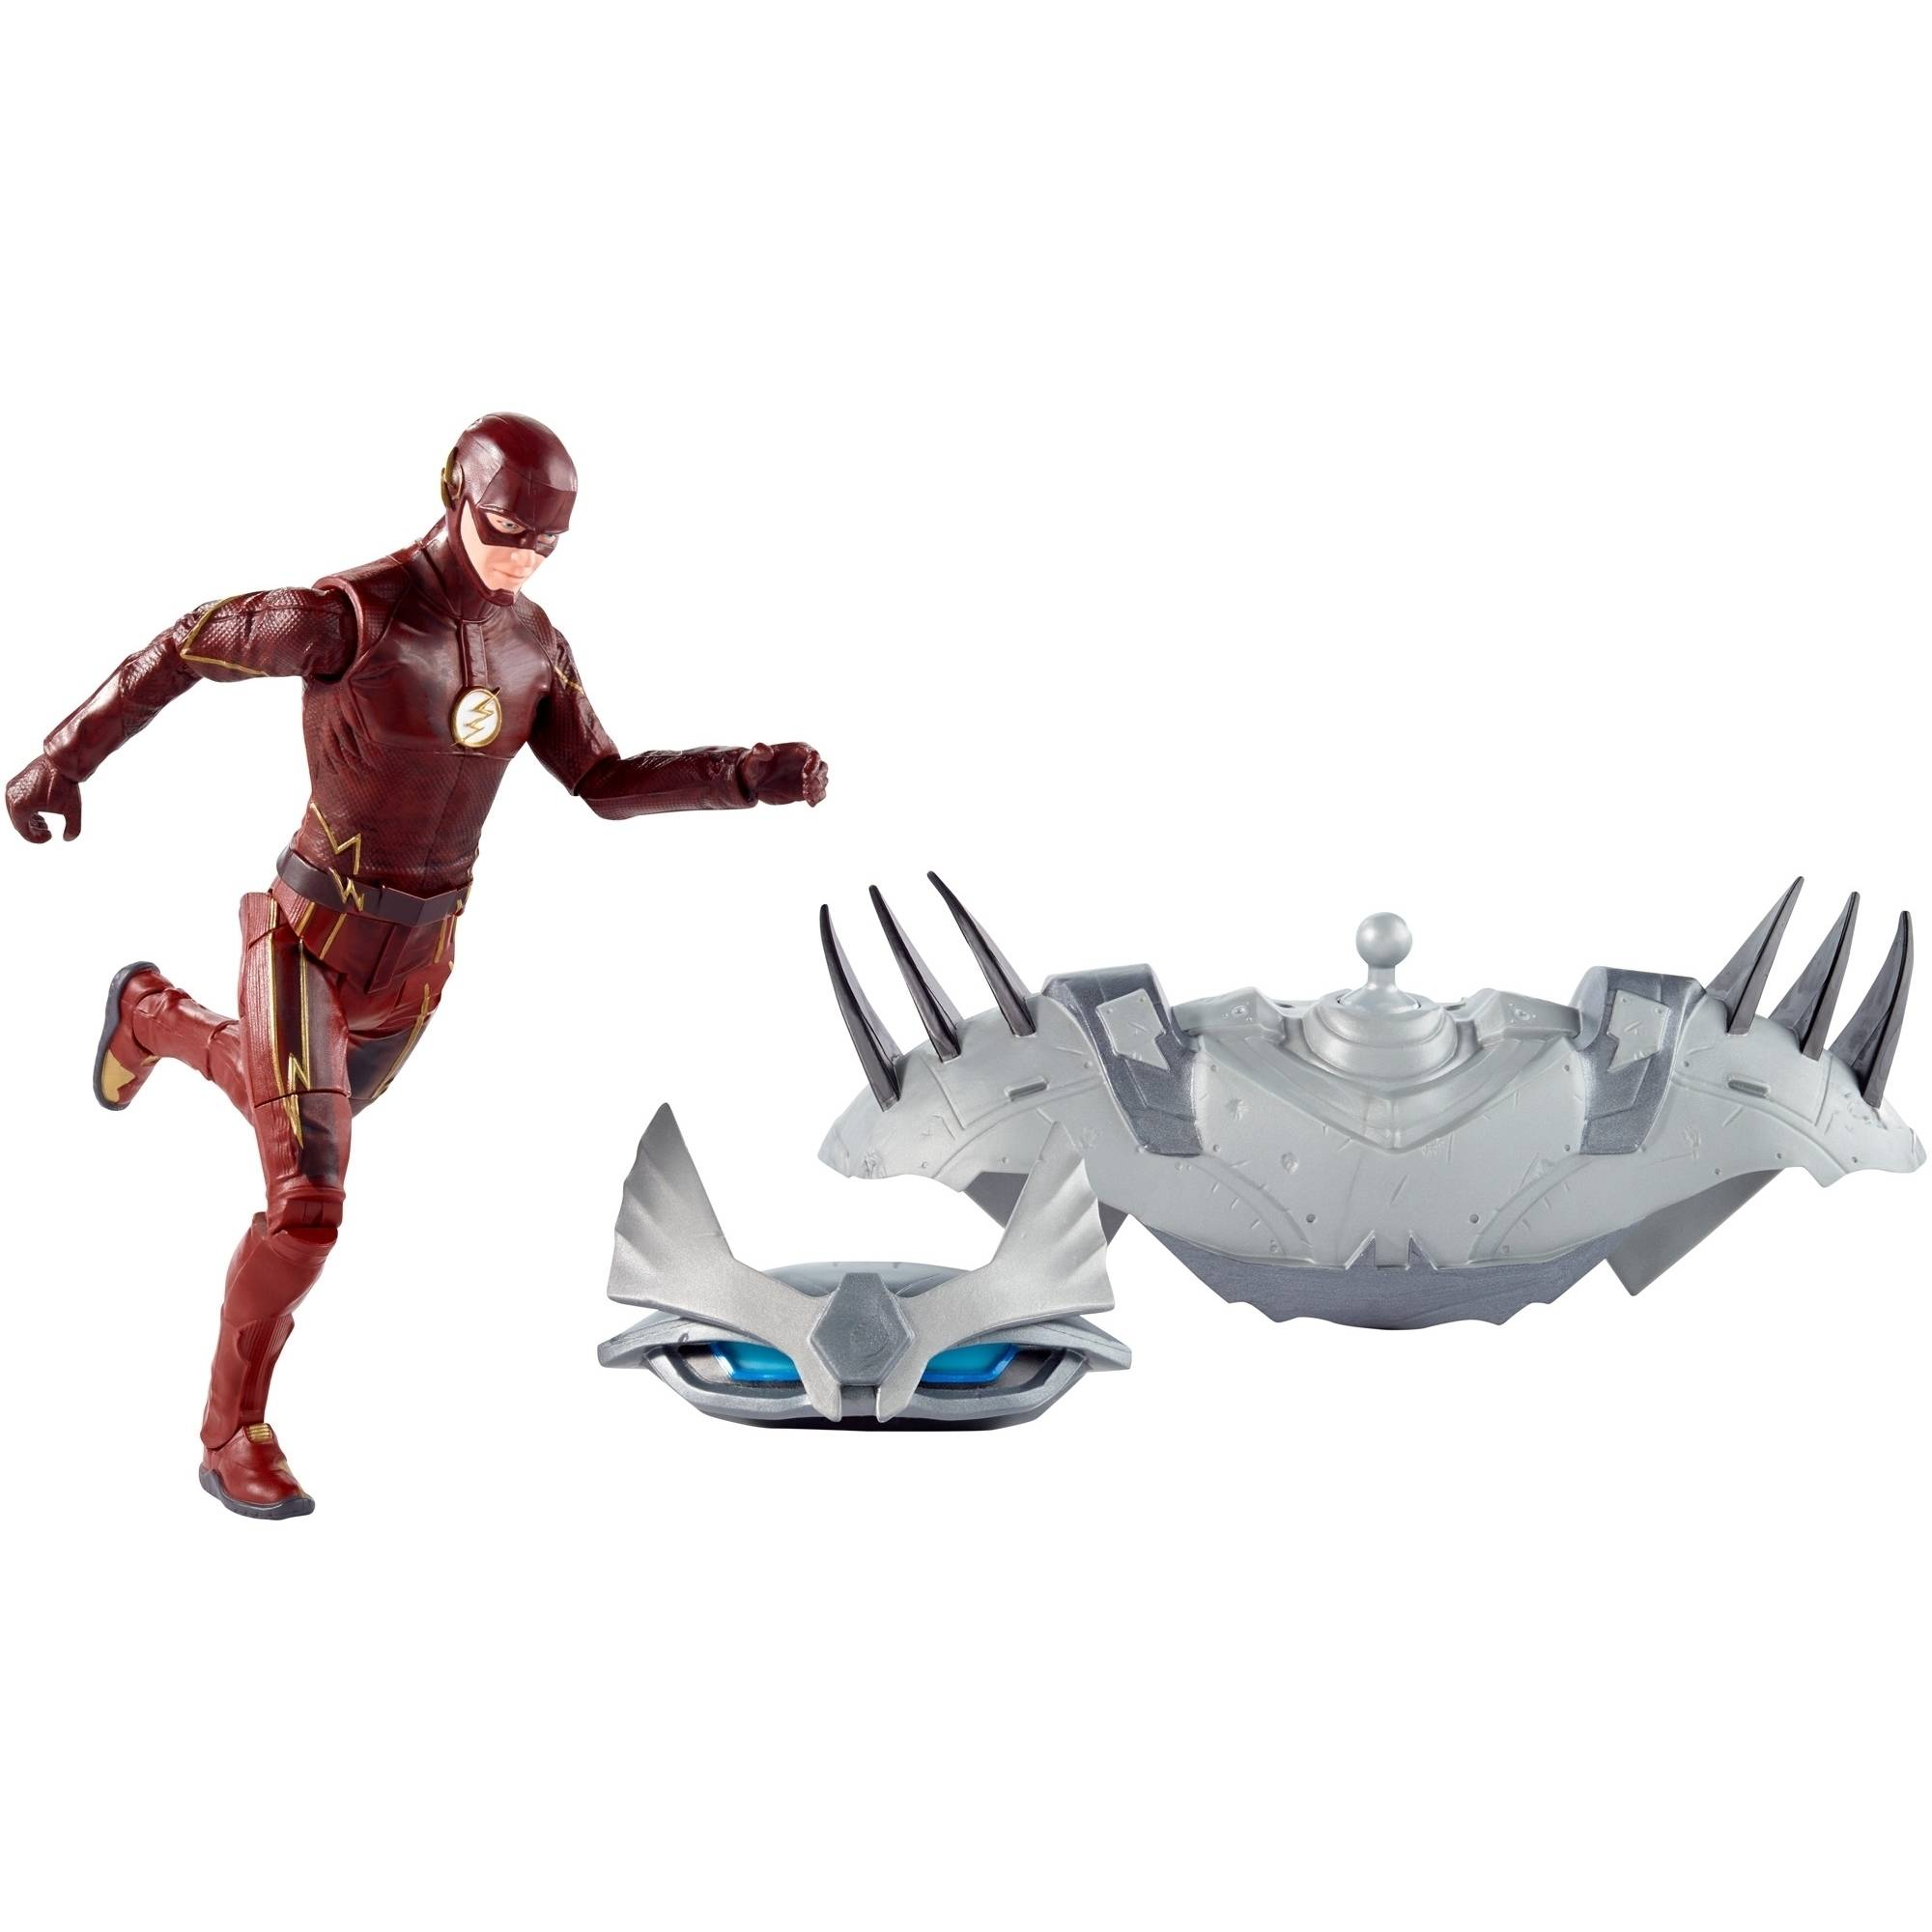 DC Comics Multiverse The Flash TV Series The Flash Figure by Mattel